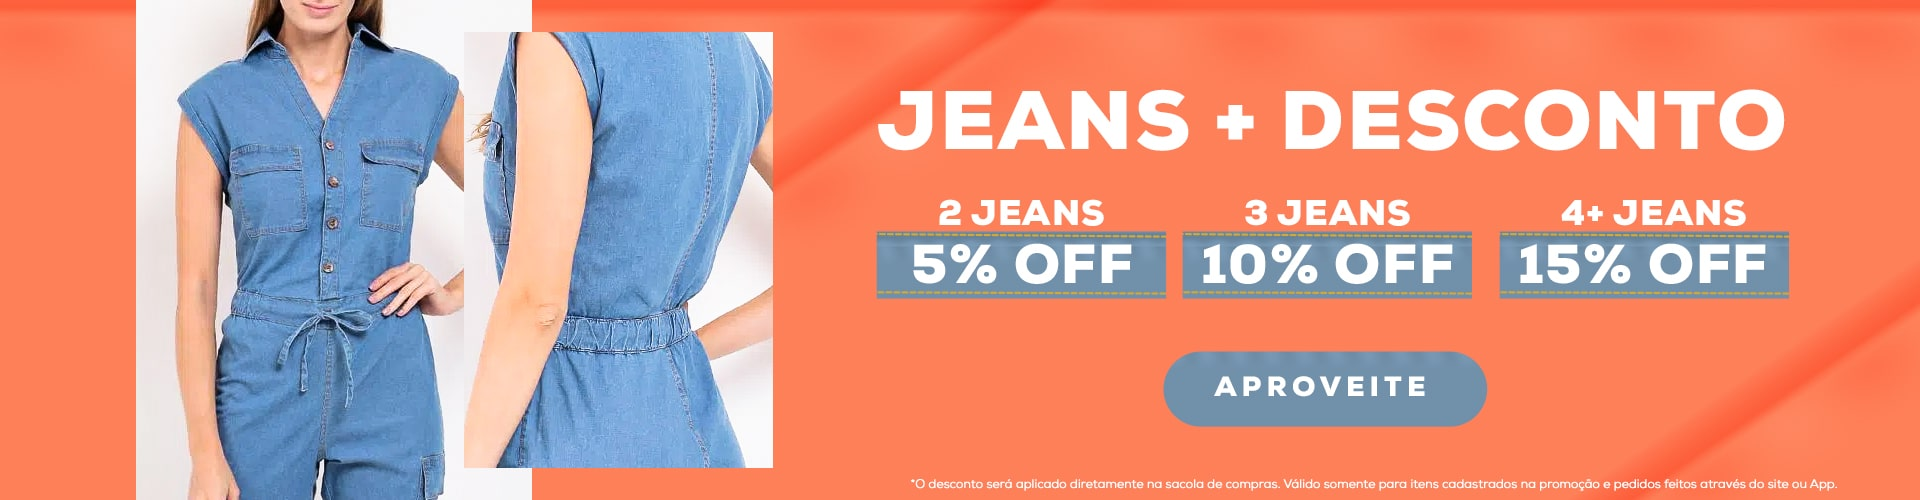 Desconto progressivo Jeans